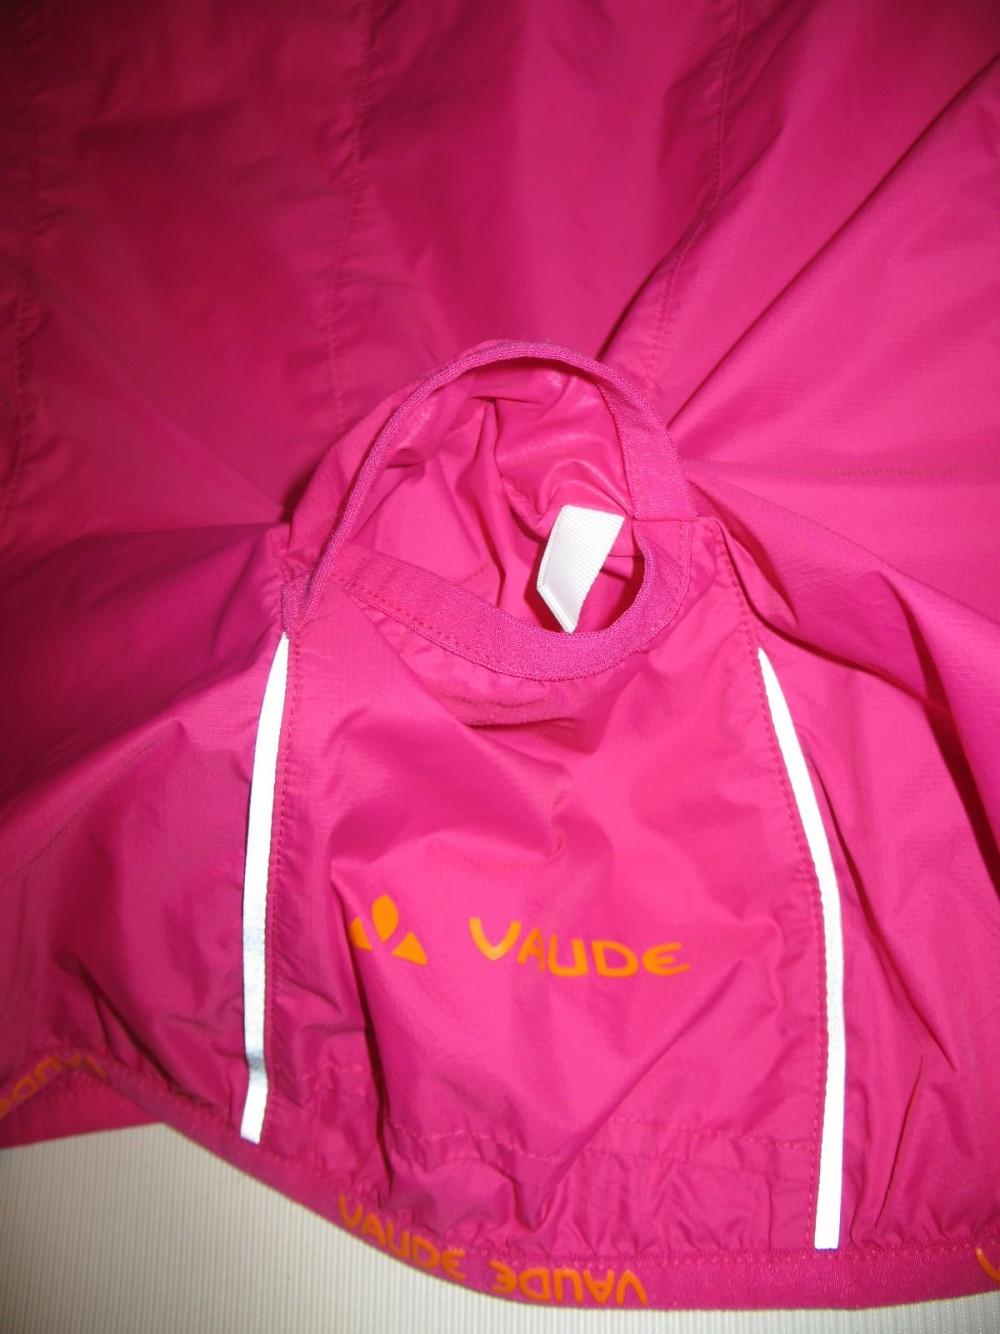 Куртка VAUDE air ll jacket lady (размер 34-XXS/XS) - 7